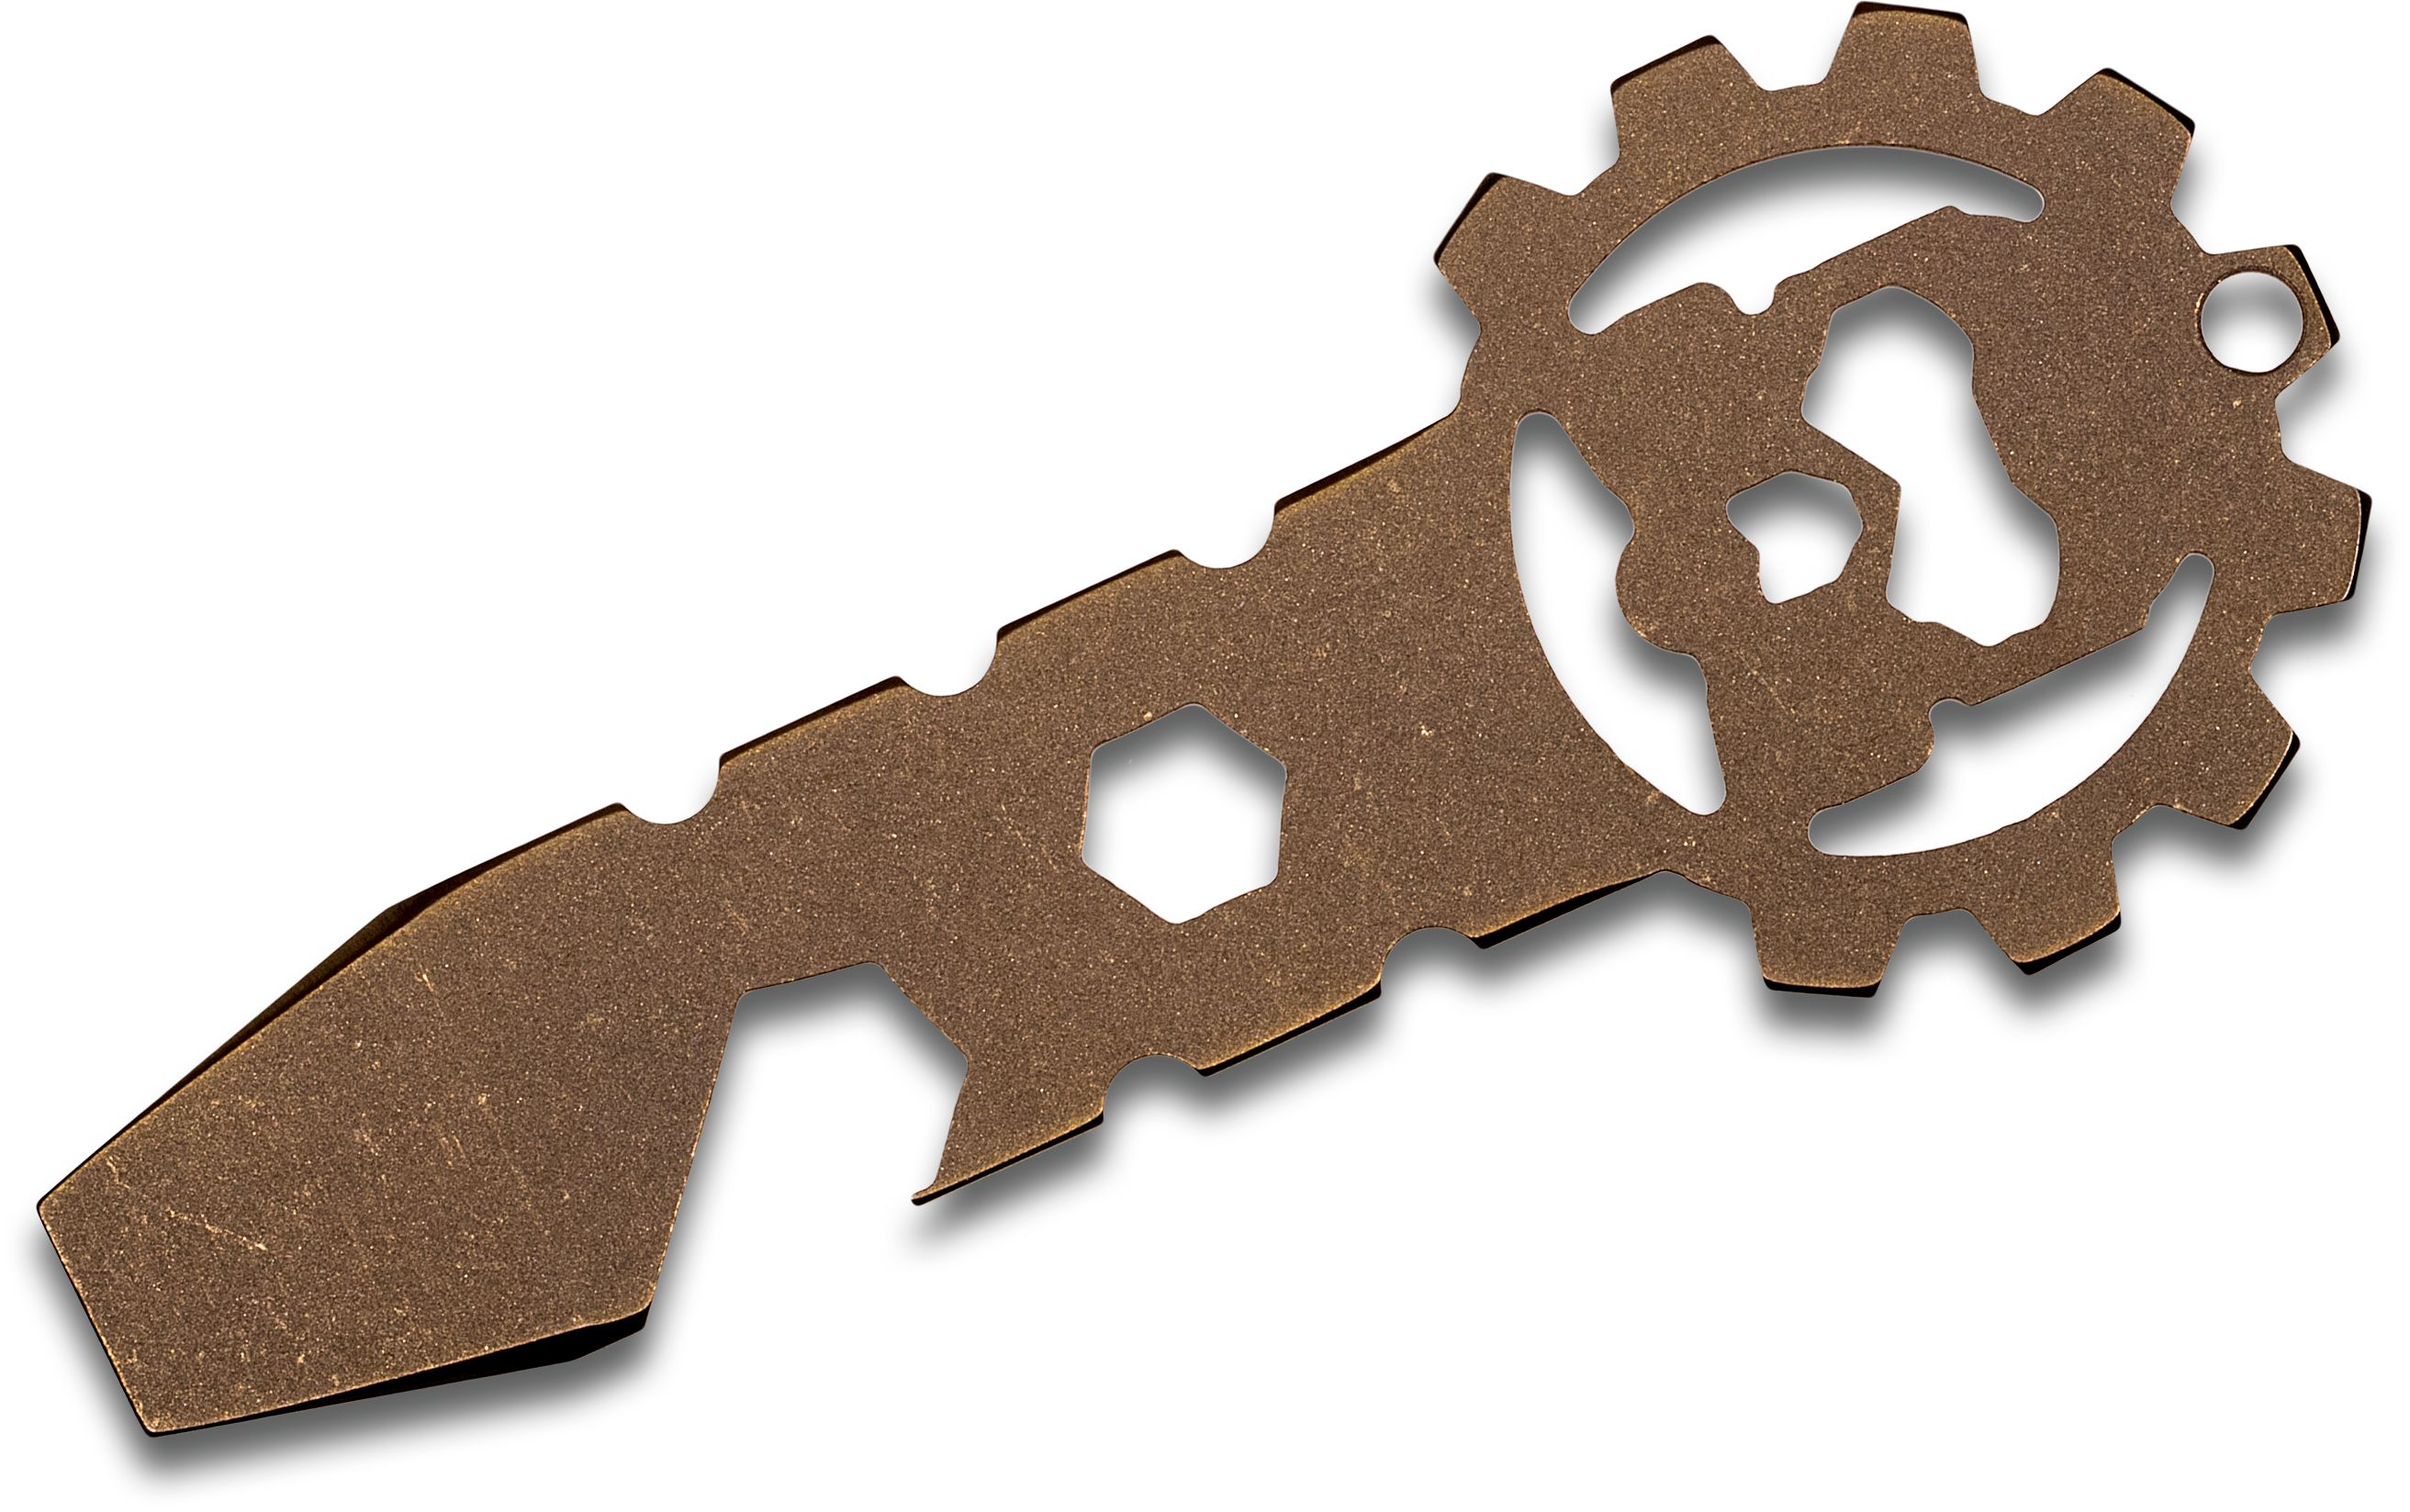 Smock Knives SmocKey Titanium Keychain Pocket Tool, Bronze Anodized, 3.25 inch Overall